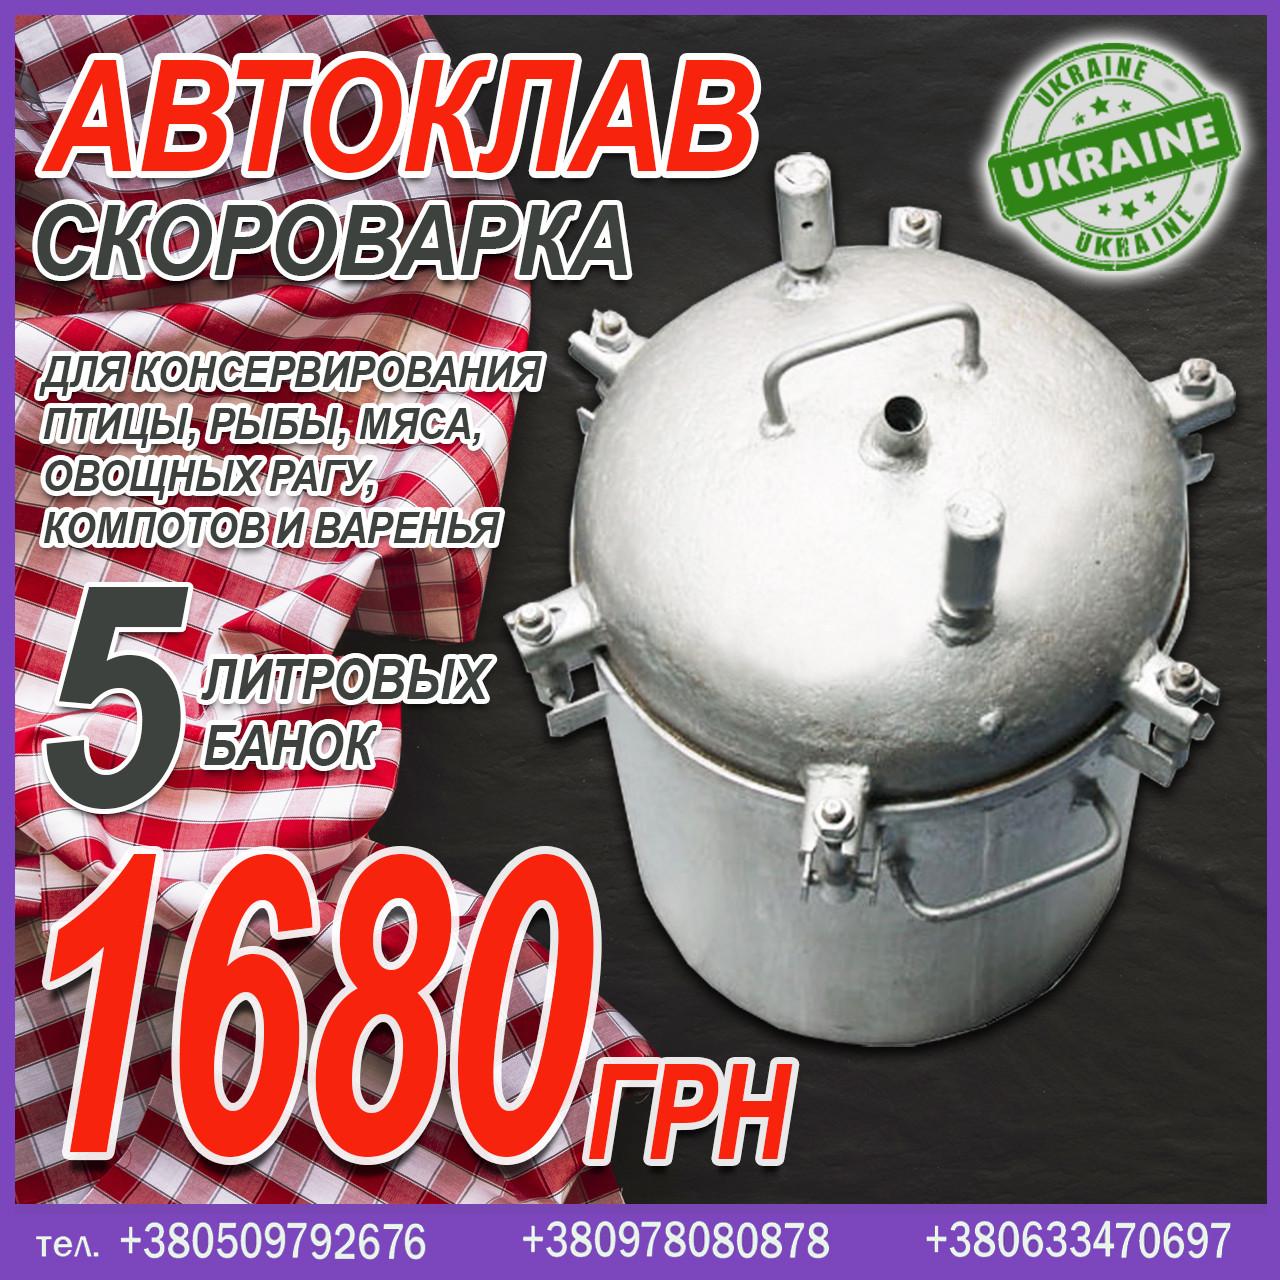 Автоклав цена, автоклав скороварка (5 литровых банок)